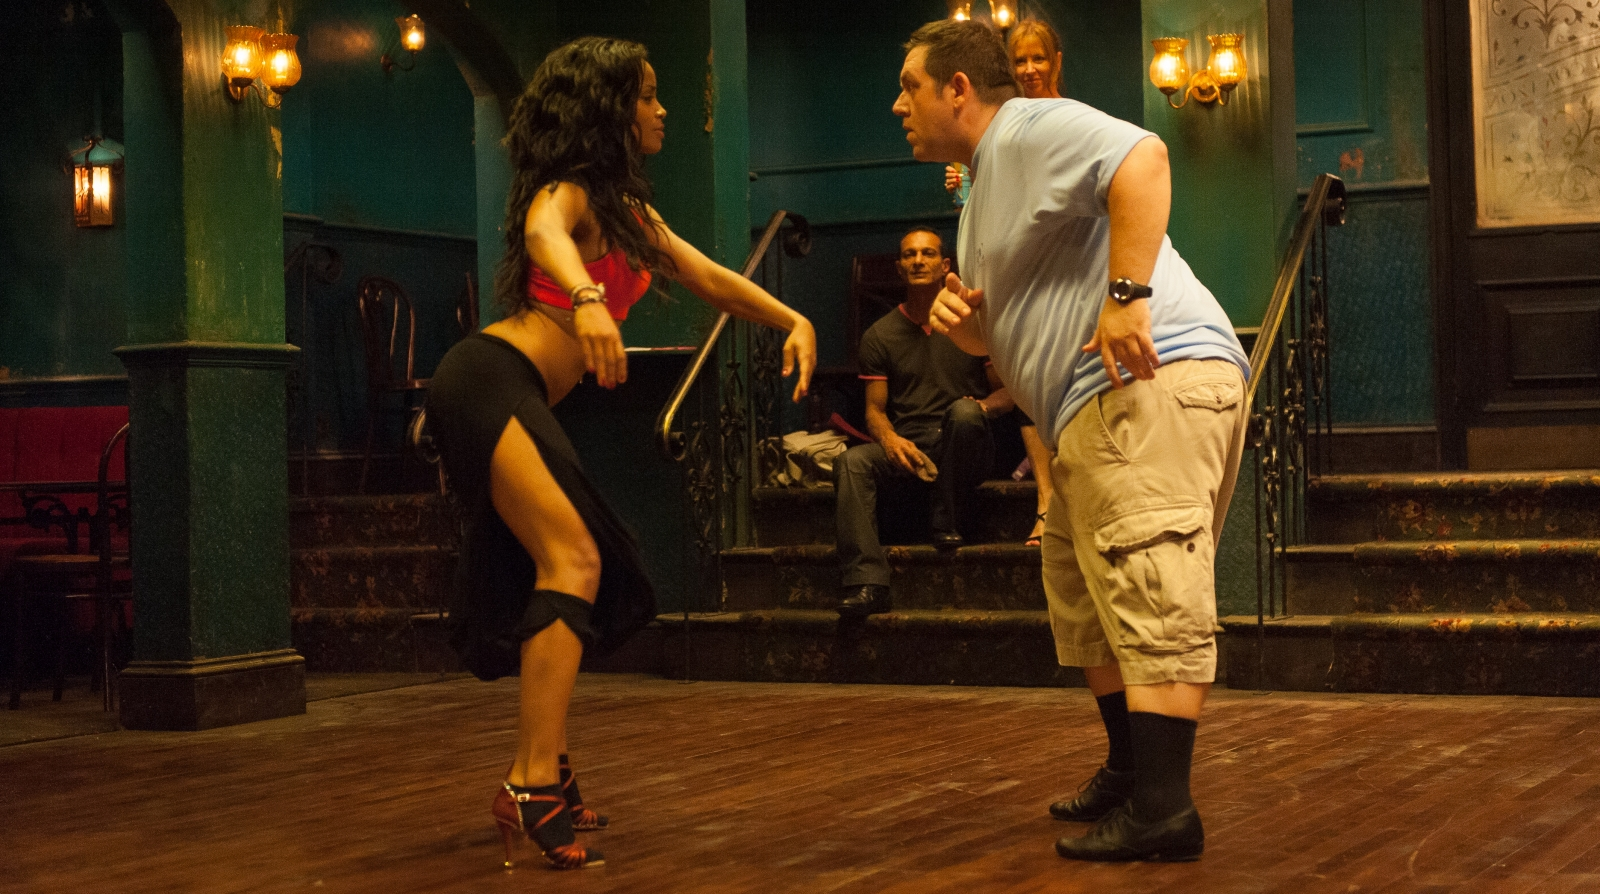 Cuban Fury - Best Valentine's Day films